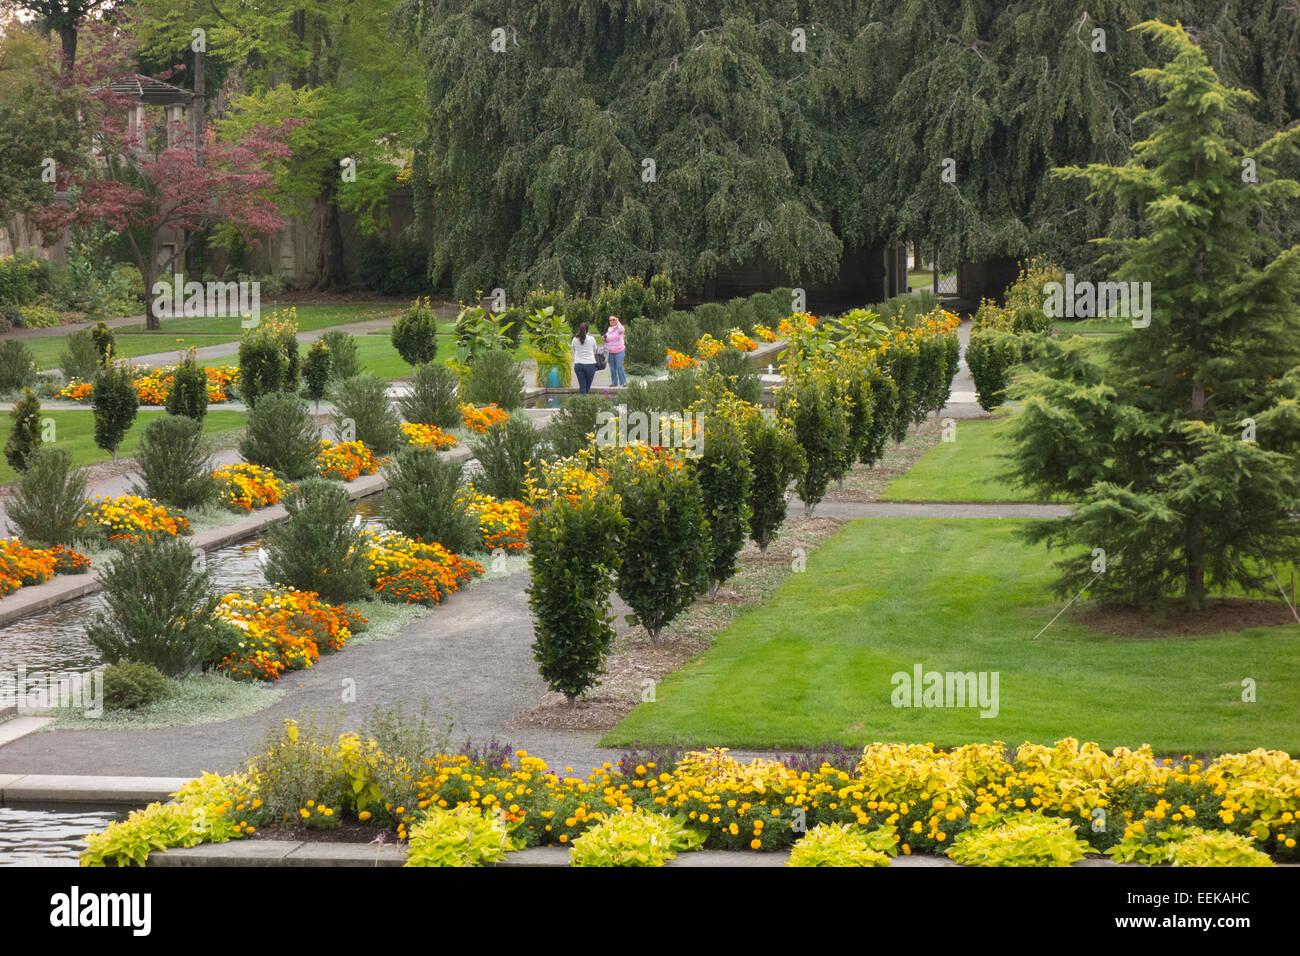 Untermyer Gardens Conservancy In Yonkers Ny Stock Photo 77872072